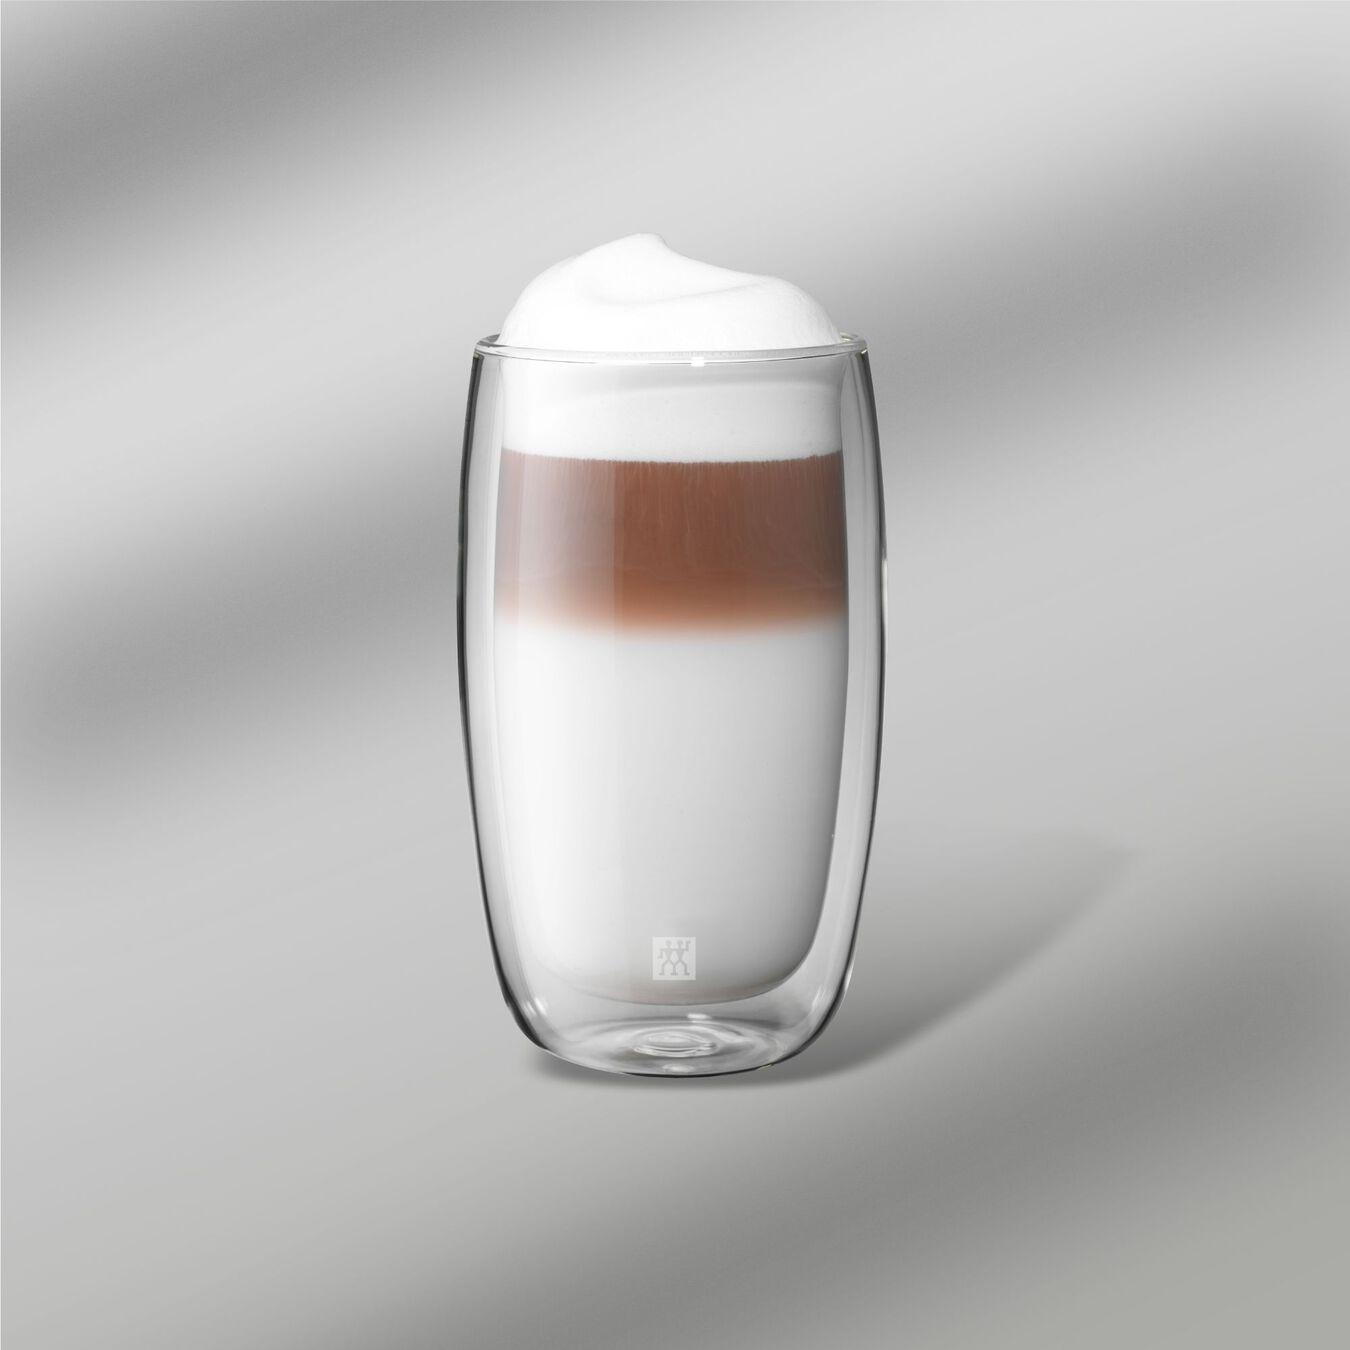 Latte macchiato glazenset, 2-delig,,large 4